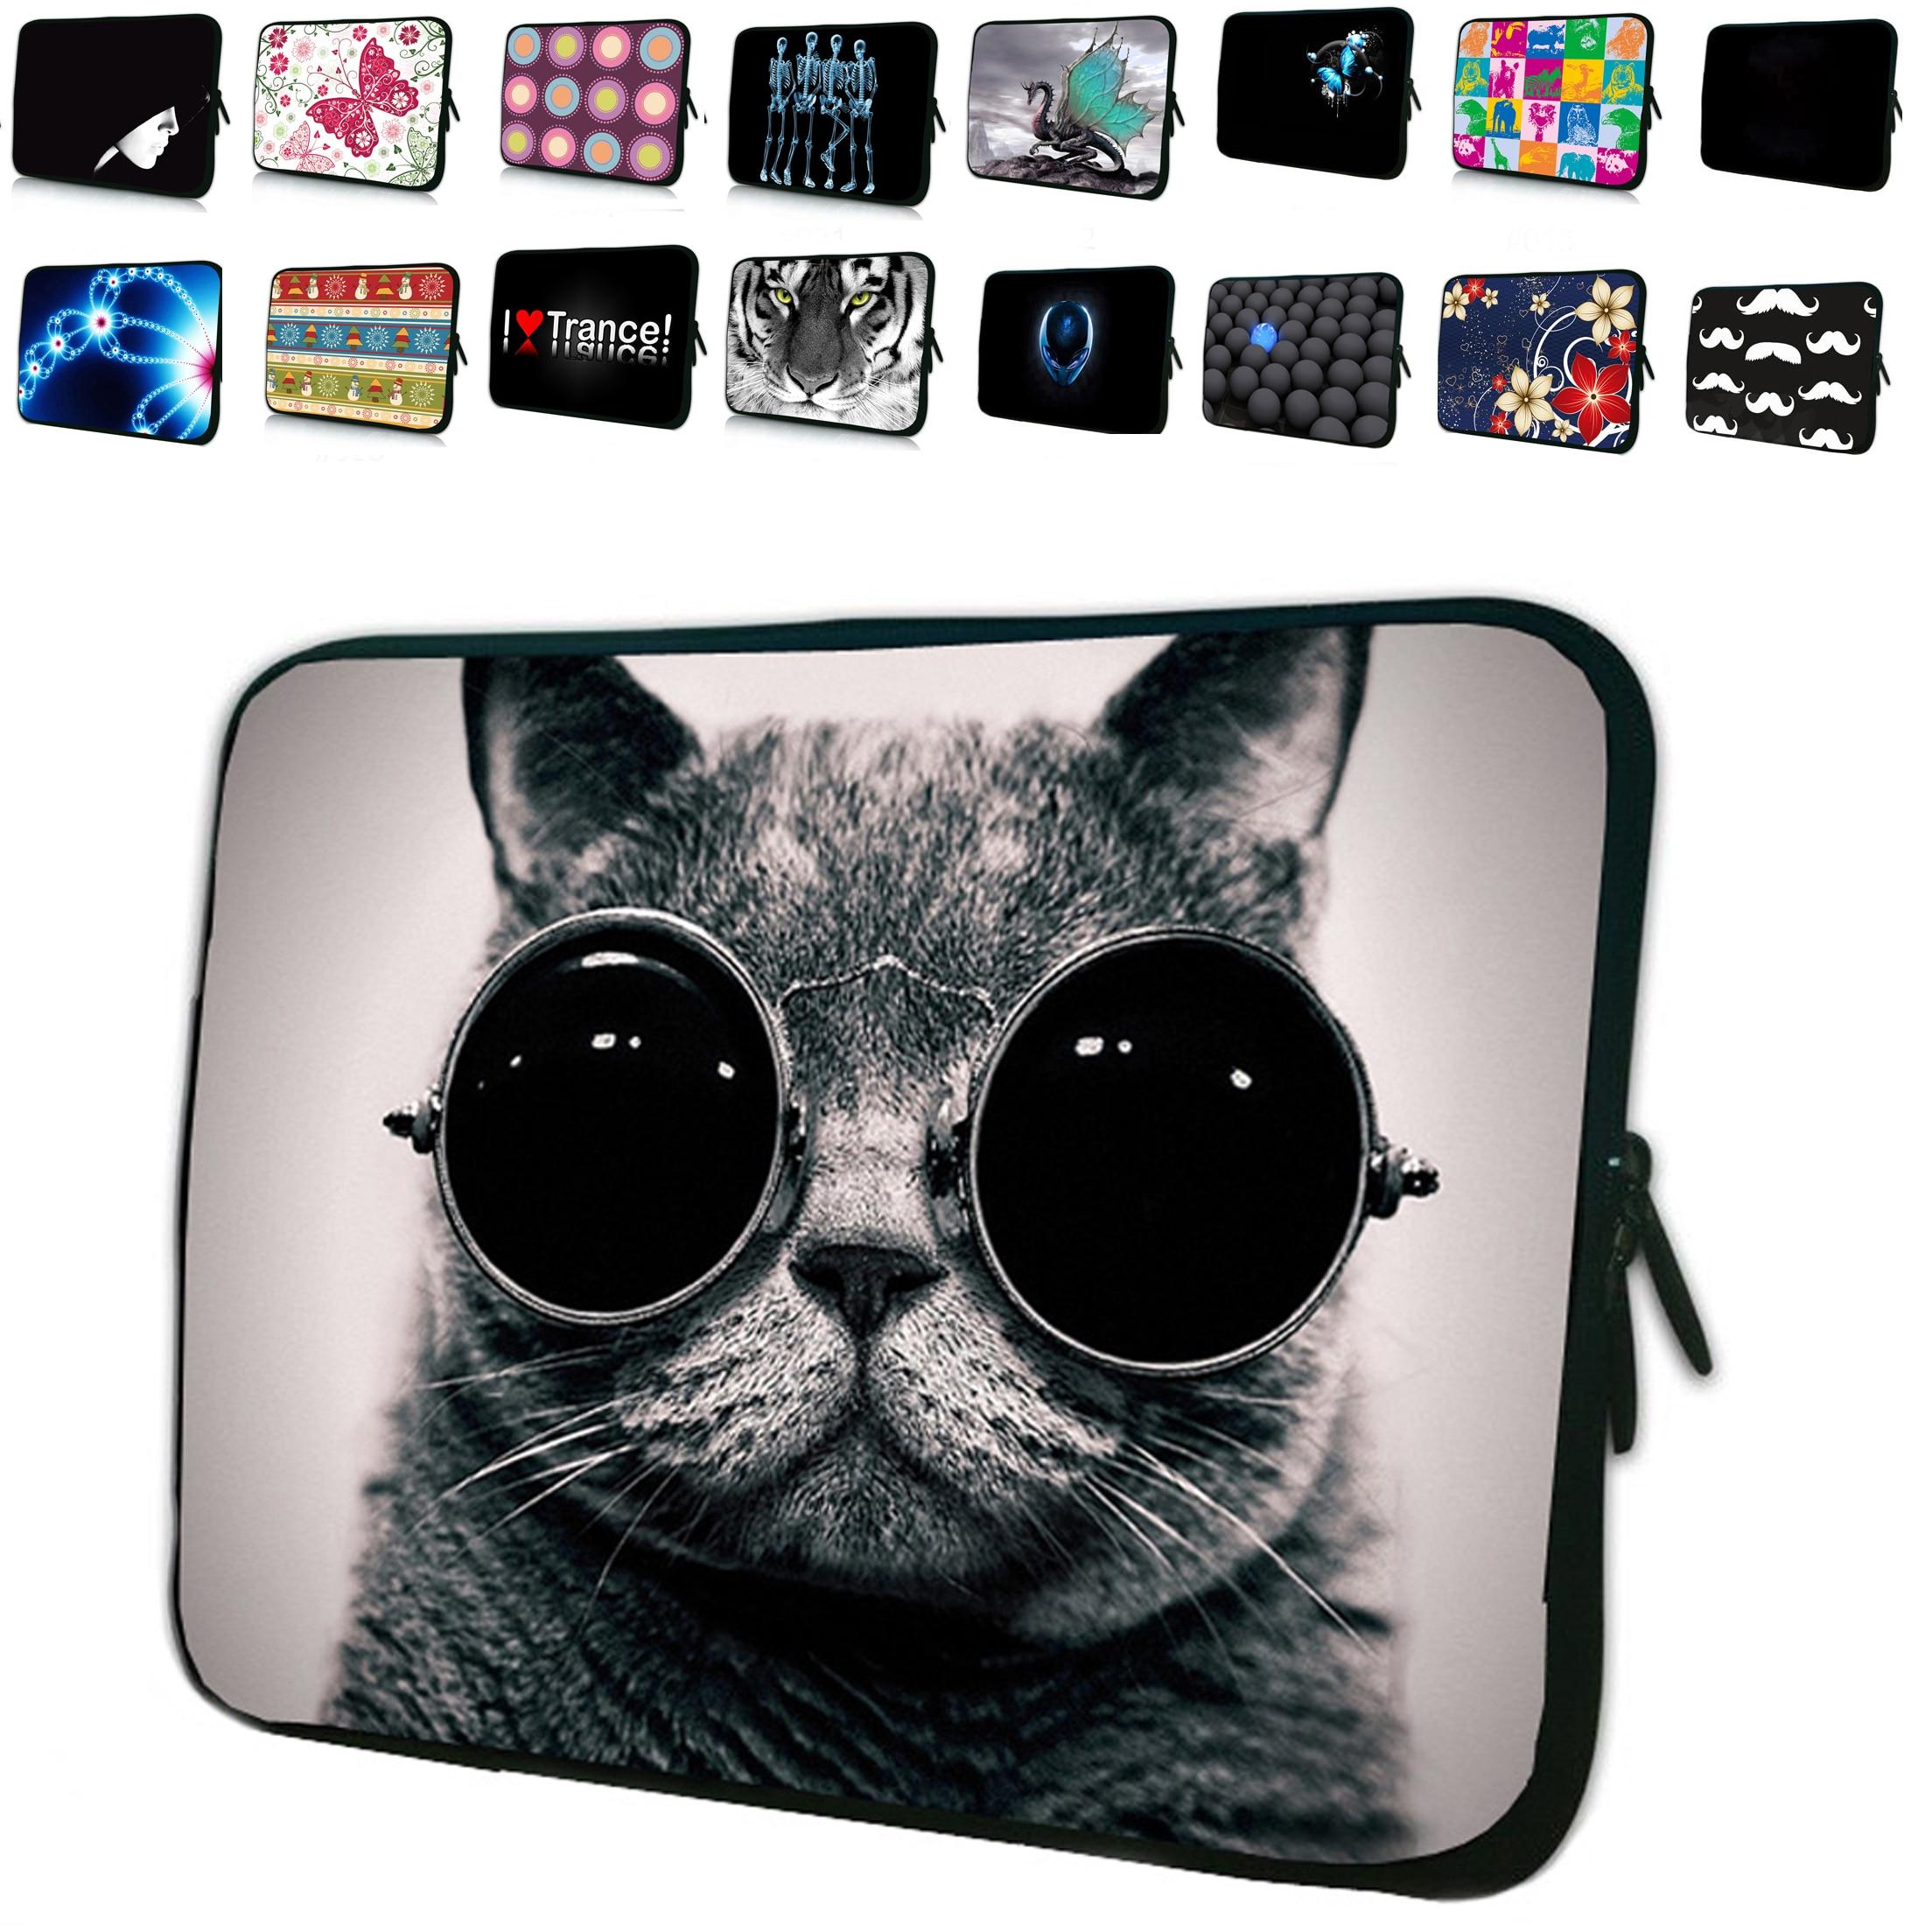 Latest 2016 neoprene soft 10 inch tablet pc sleeve bag for Housse neoprene ipad air